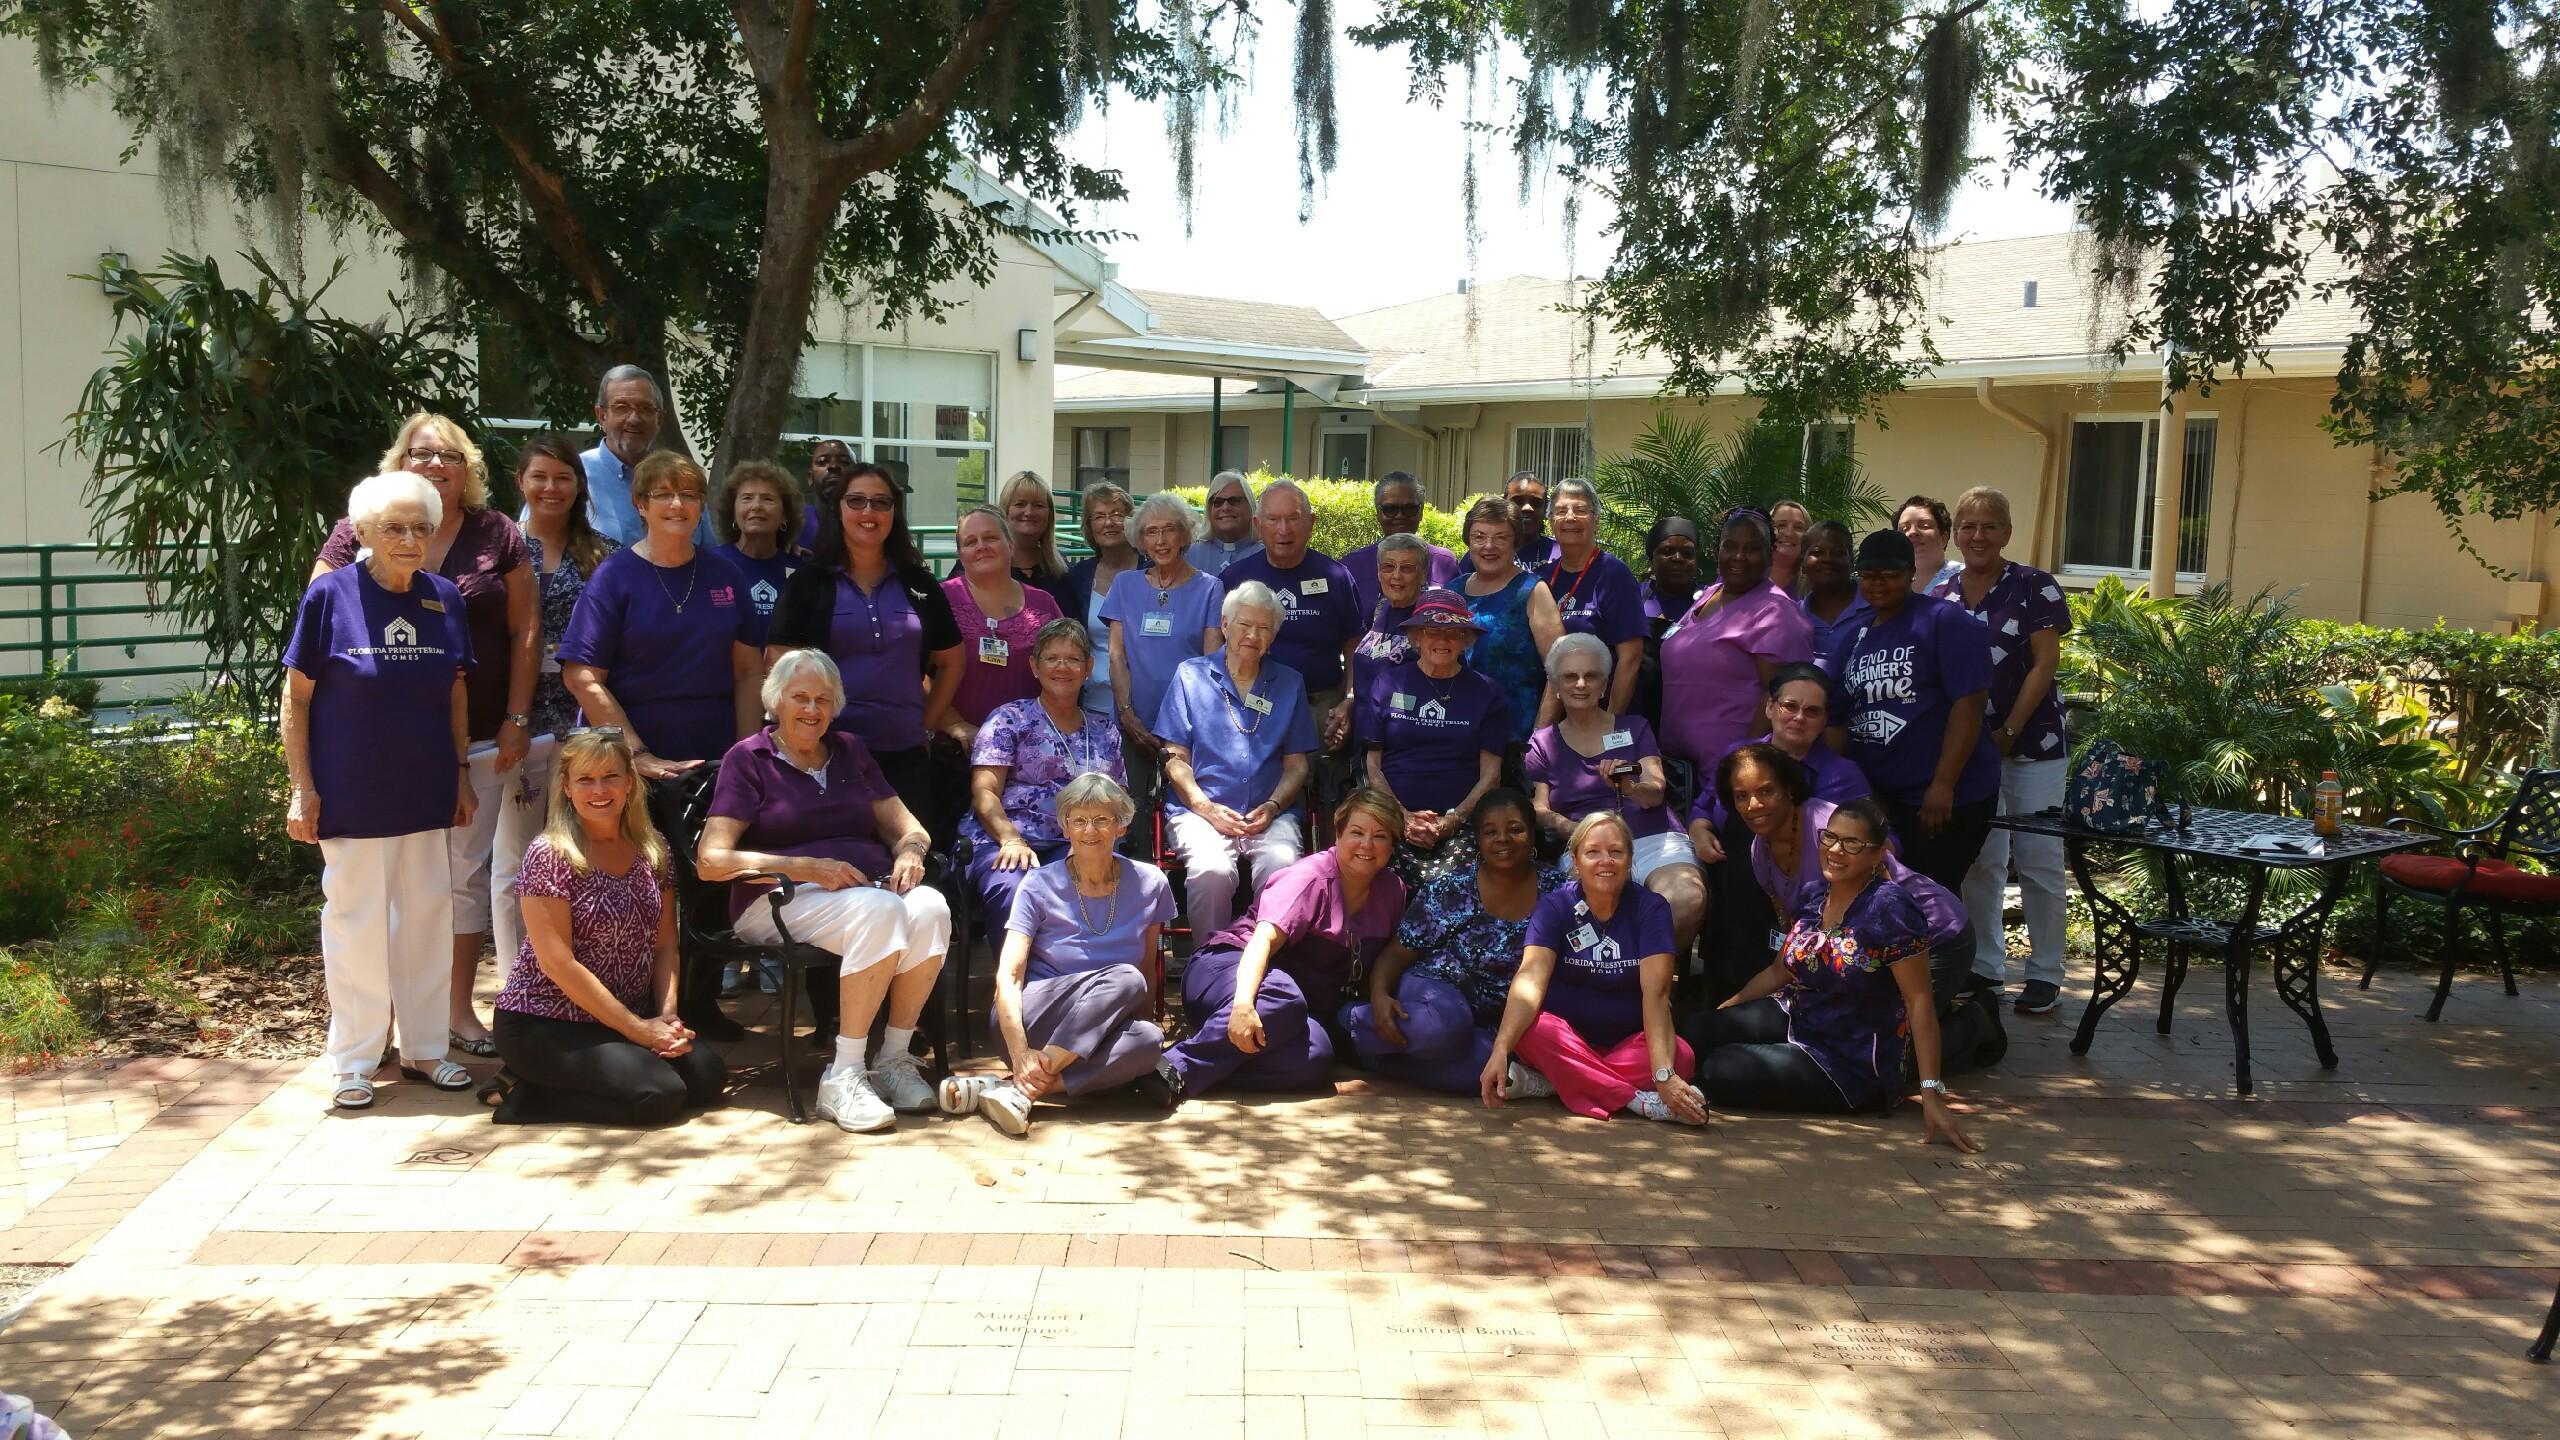 Elder Abuse Awareness Day 2016